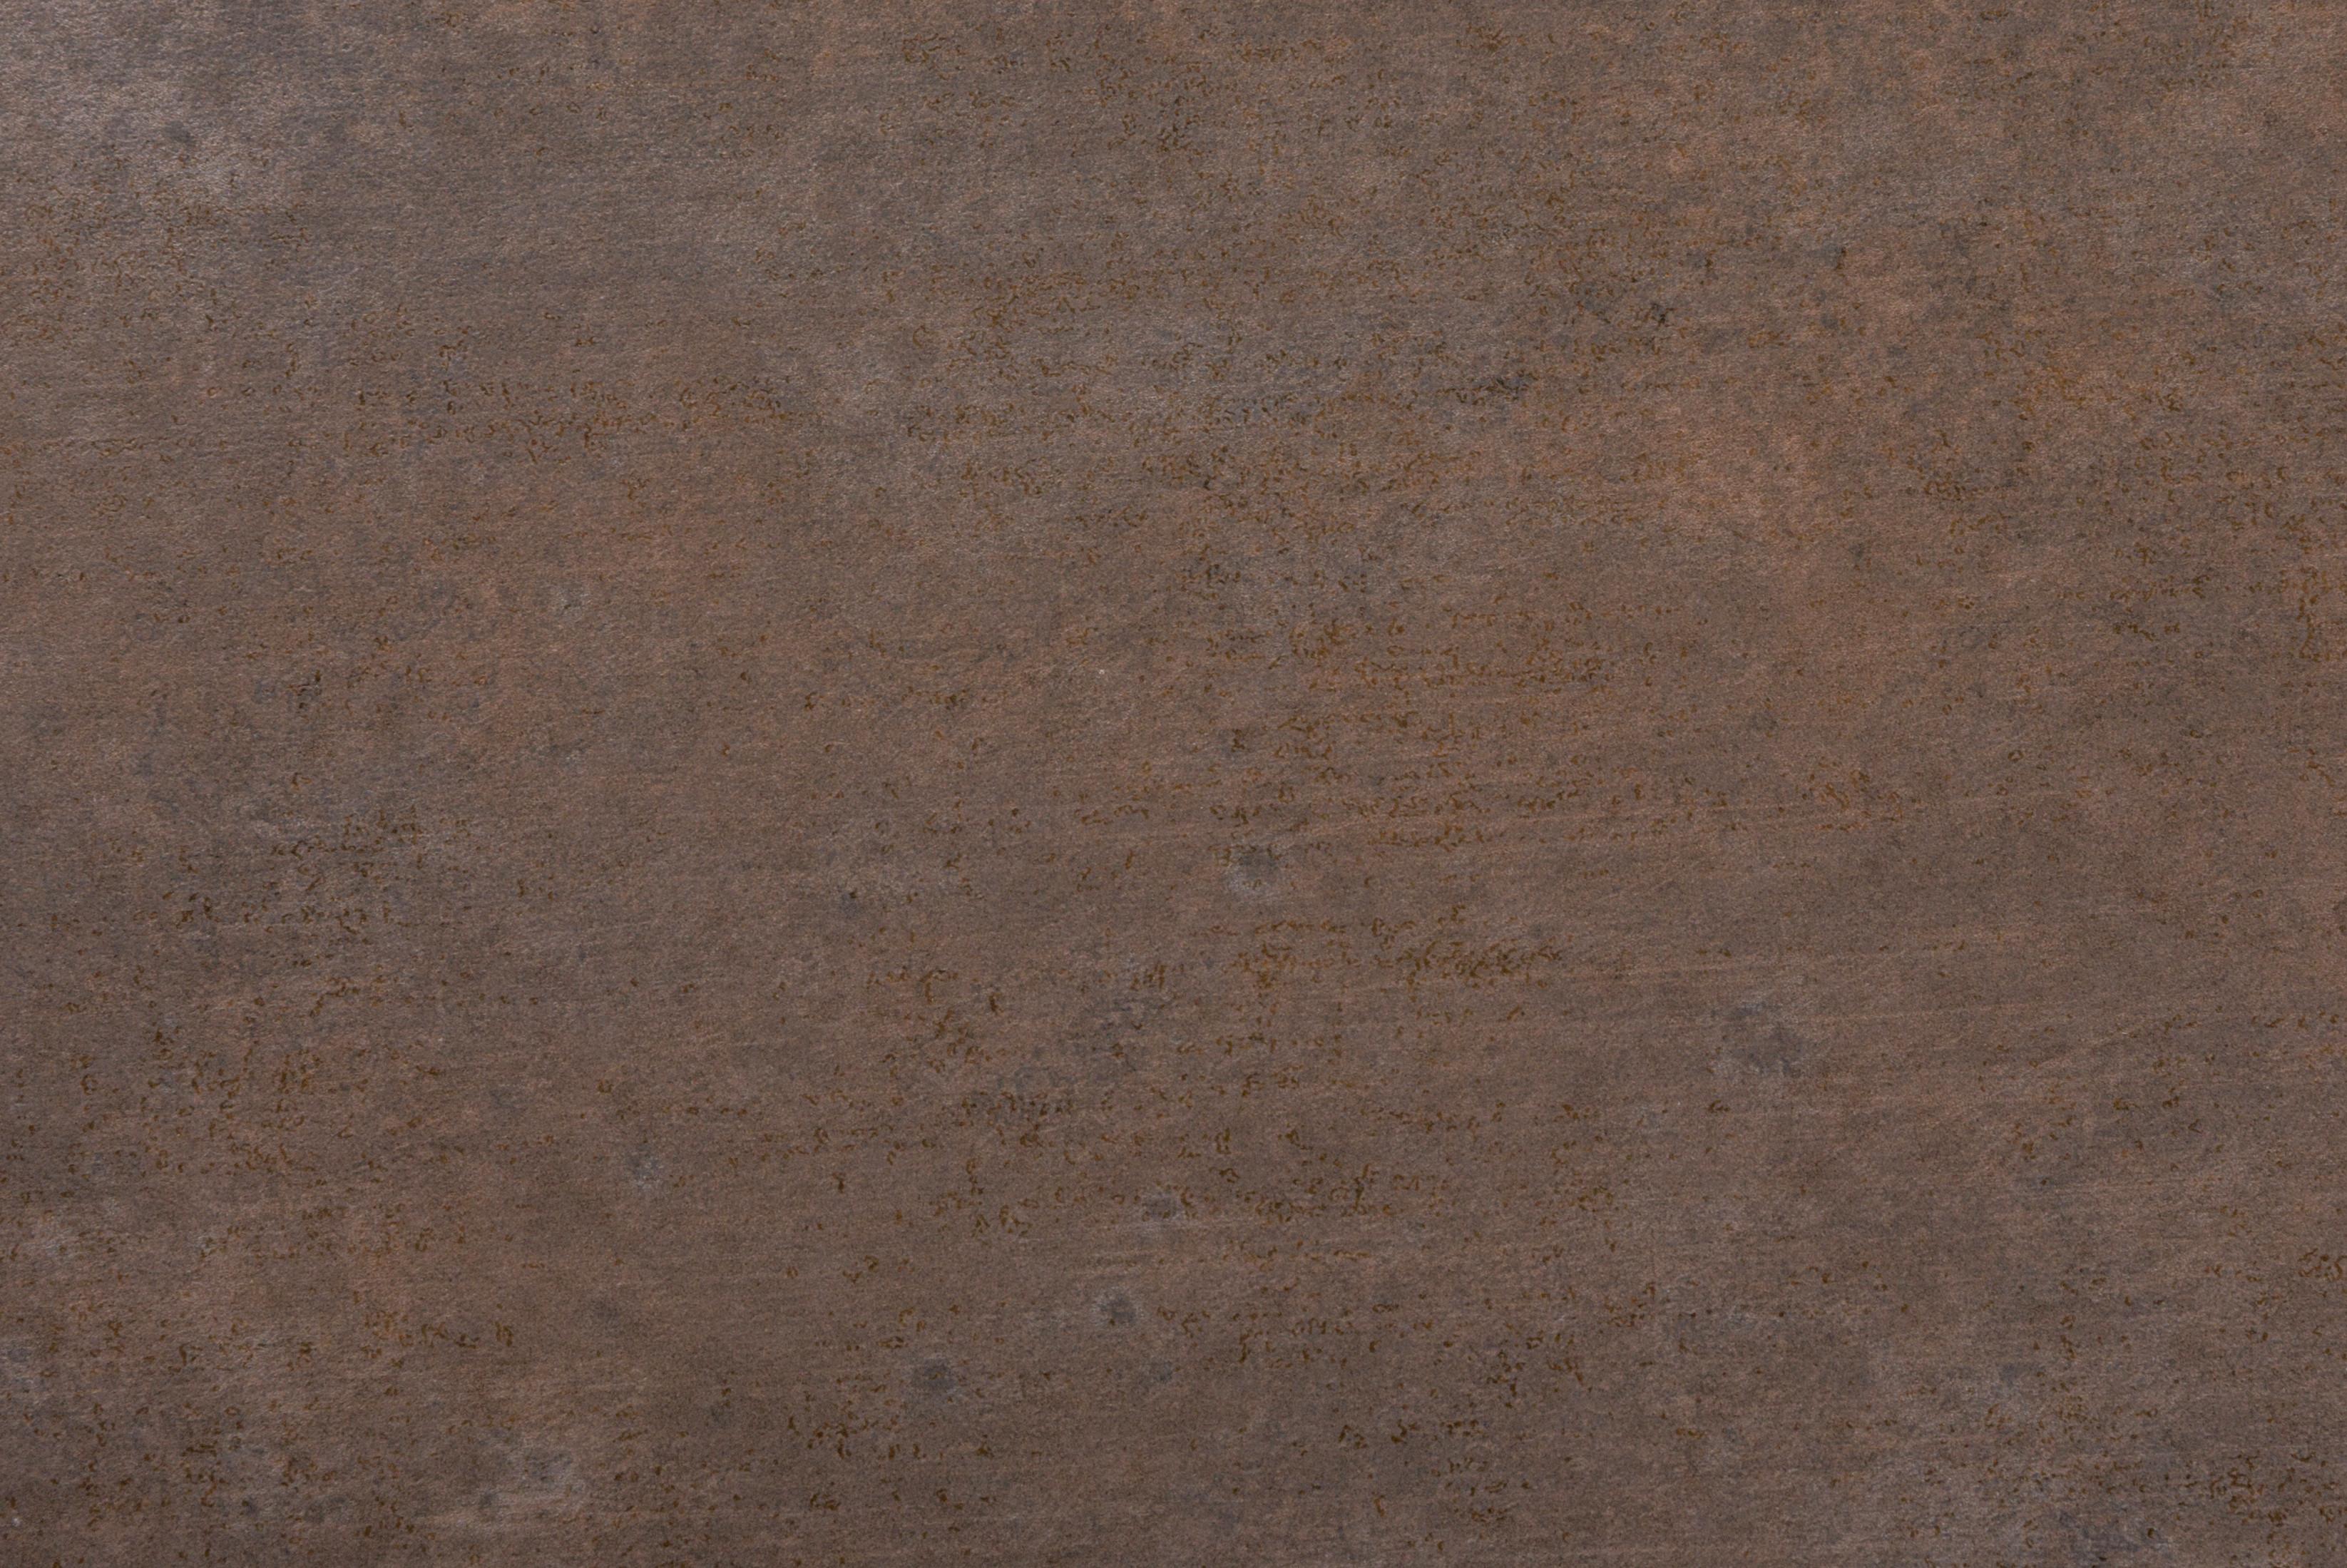 Bodenfliesen Sonderposten Beton cobre matt 75x75 cm Betonoptik